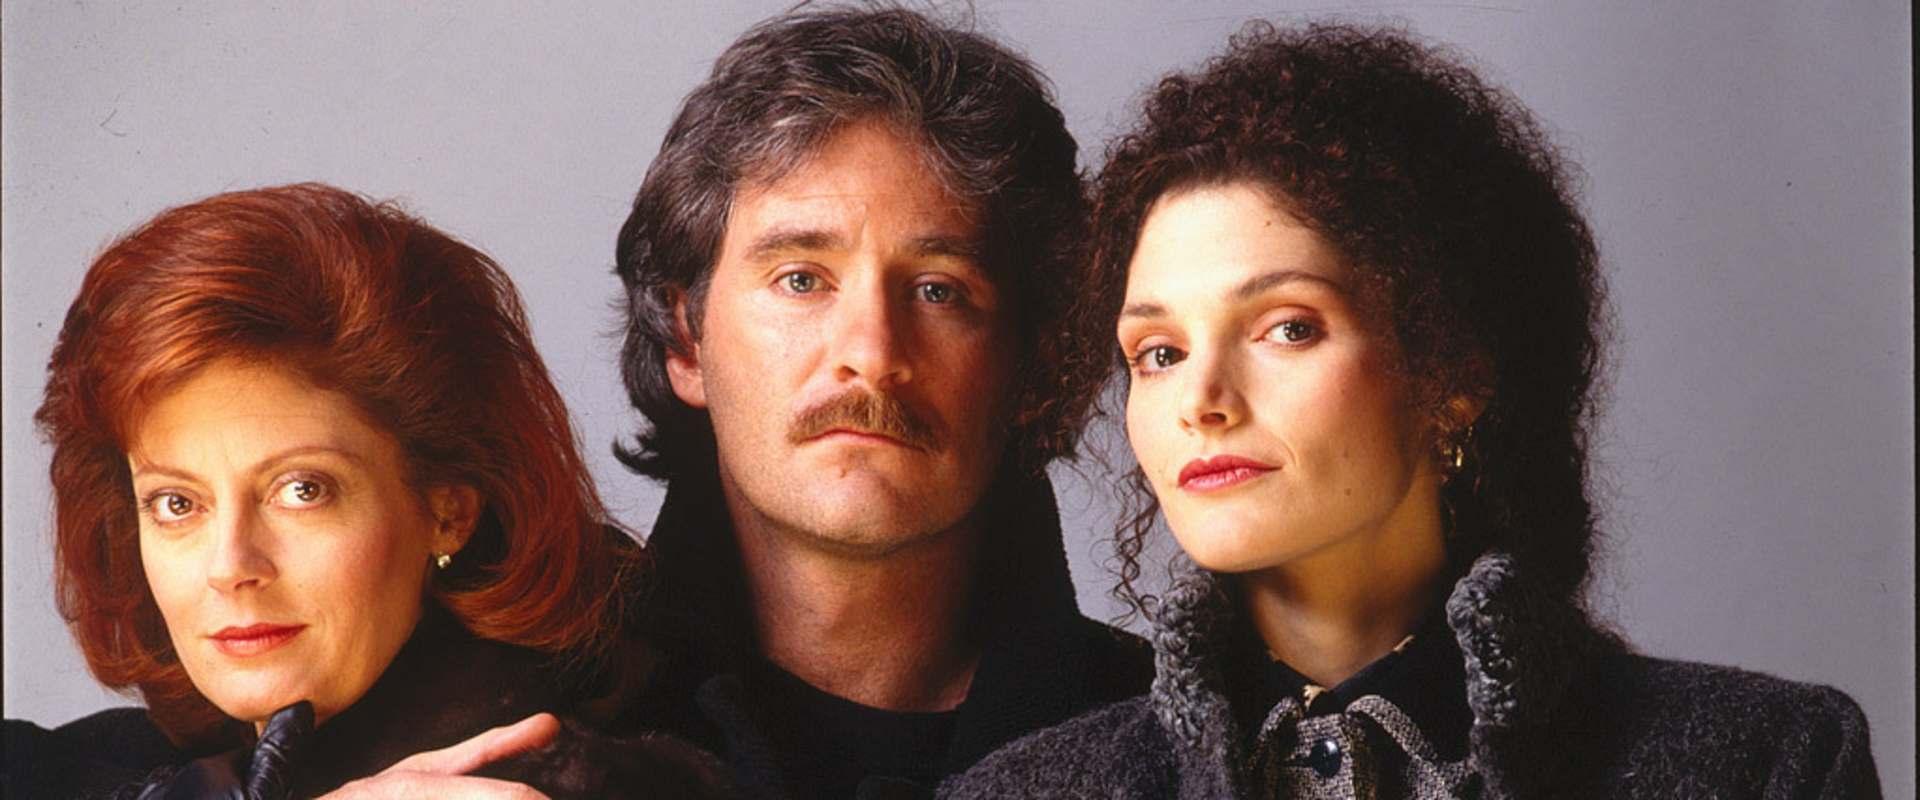 1989 Flashback: The January Man